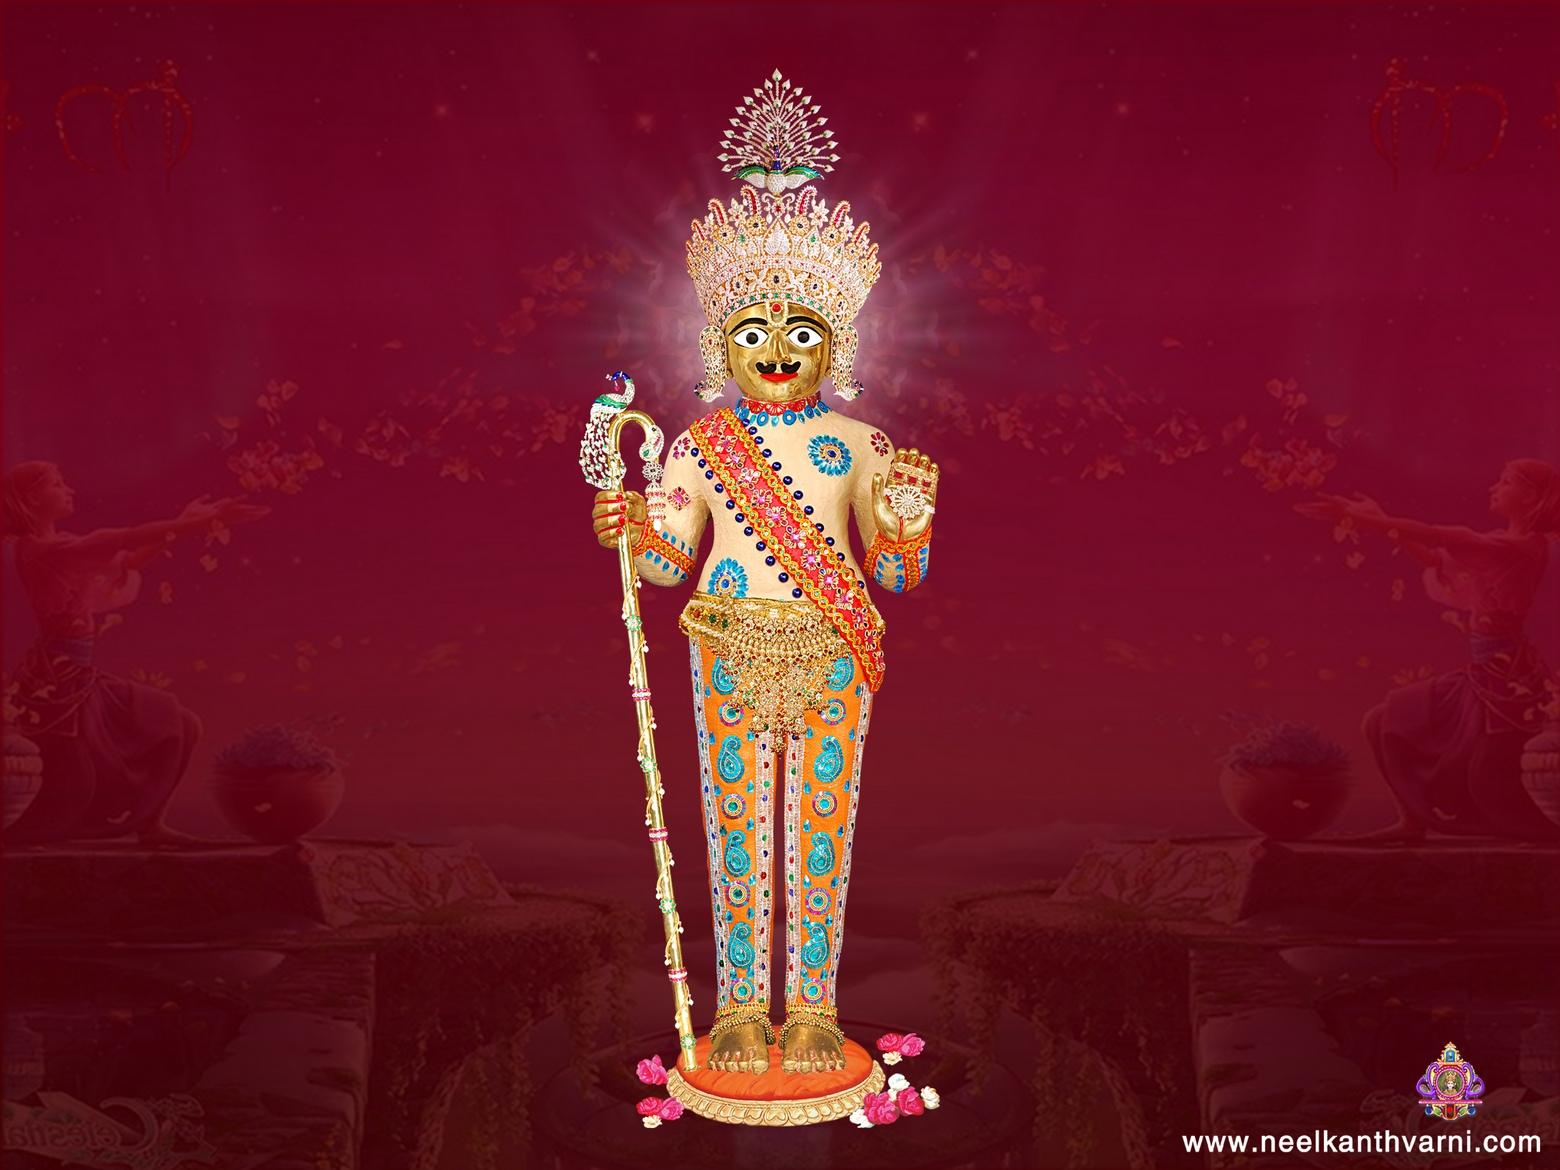 Ghanshyam Maharaj Wallpaper Hd Jay Swaminarayan Wallpapers Harikrishna Maharaj Vadtal Images